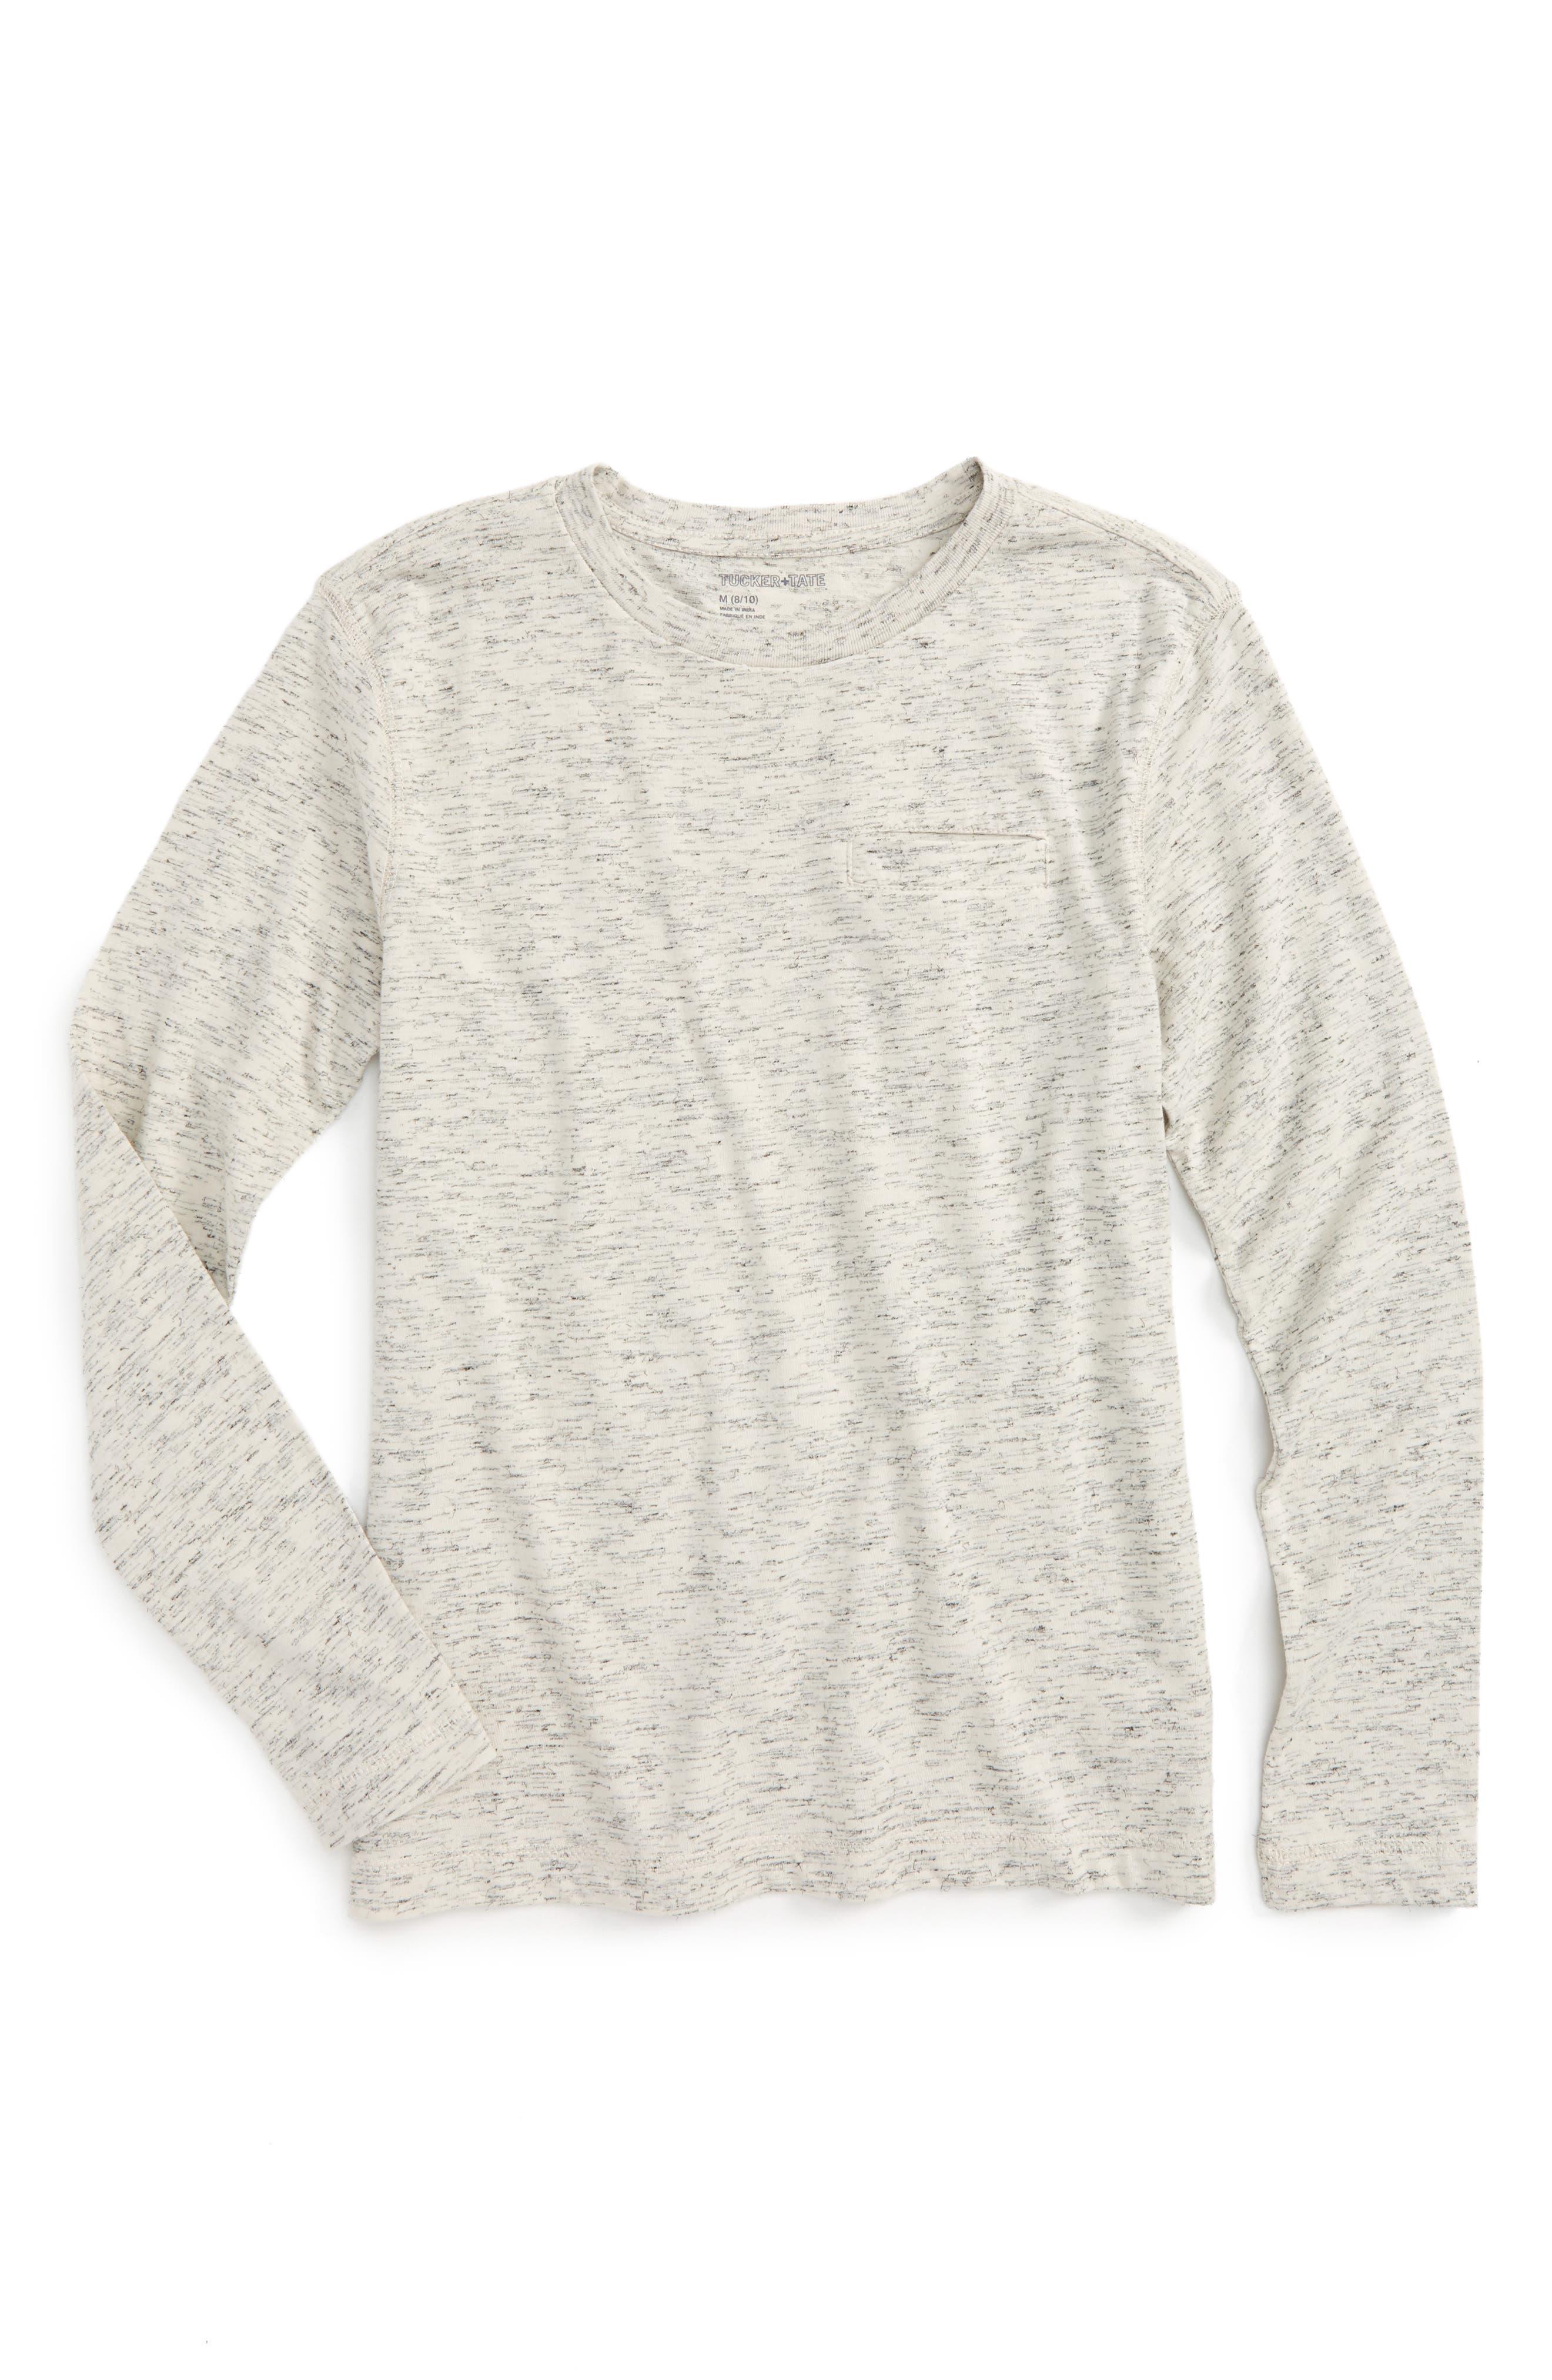 Alternate Image 1 Selected - Tucker + Tate Pocket T-Shirt (Big Boys)